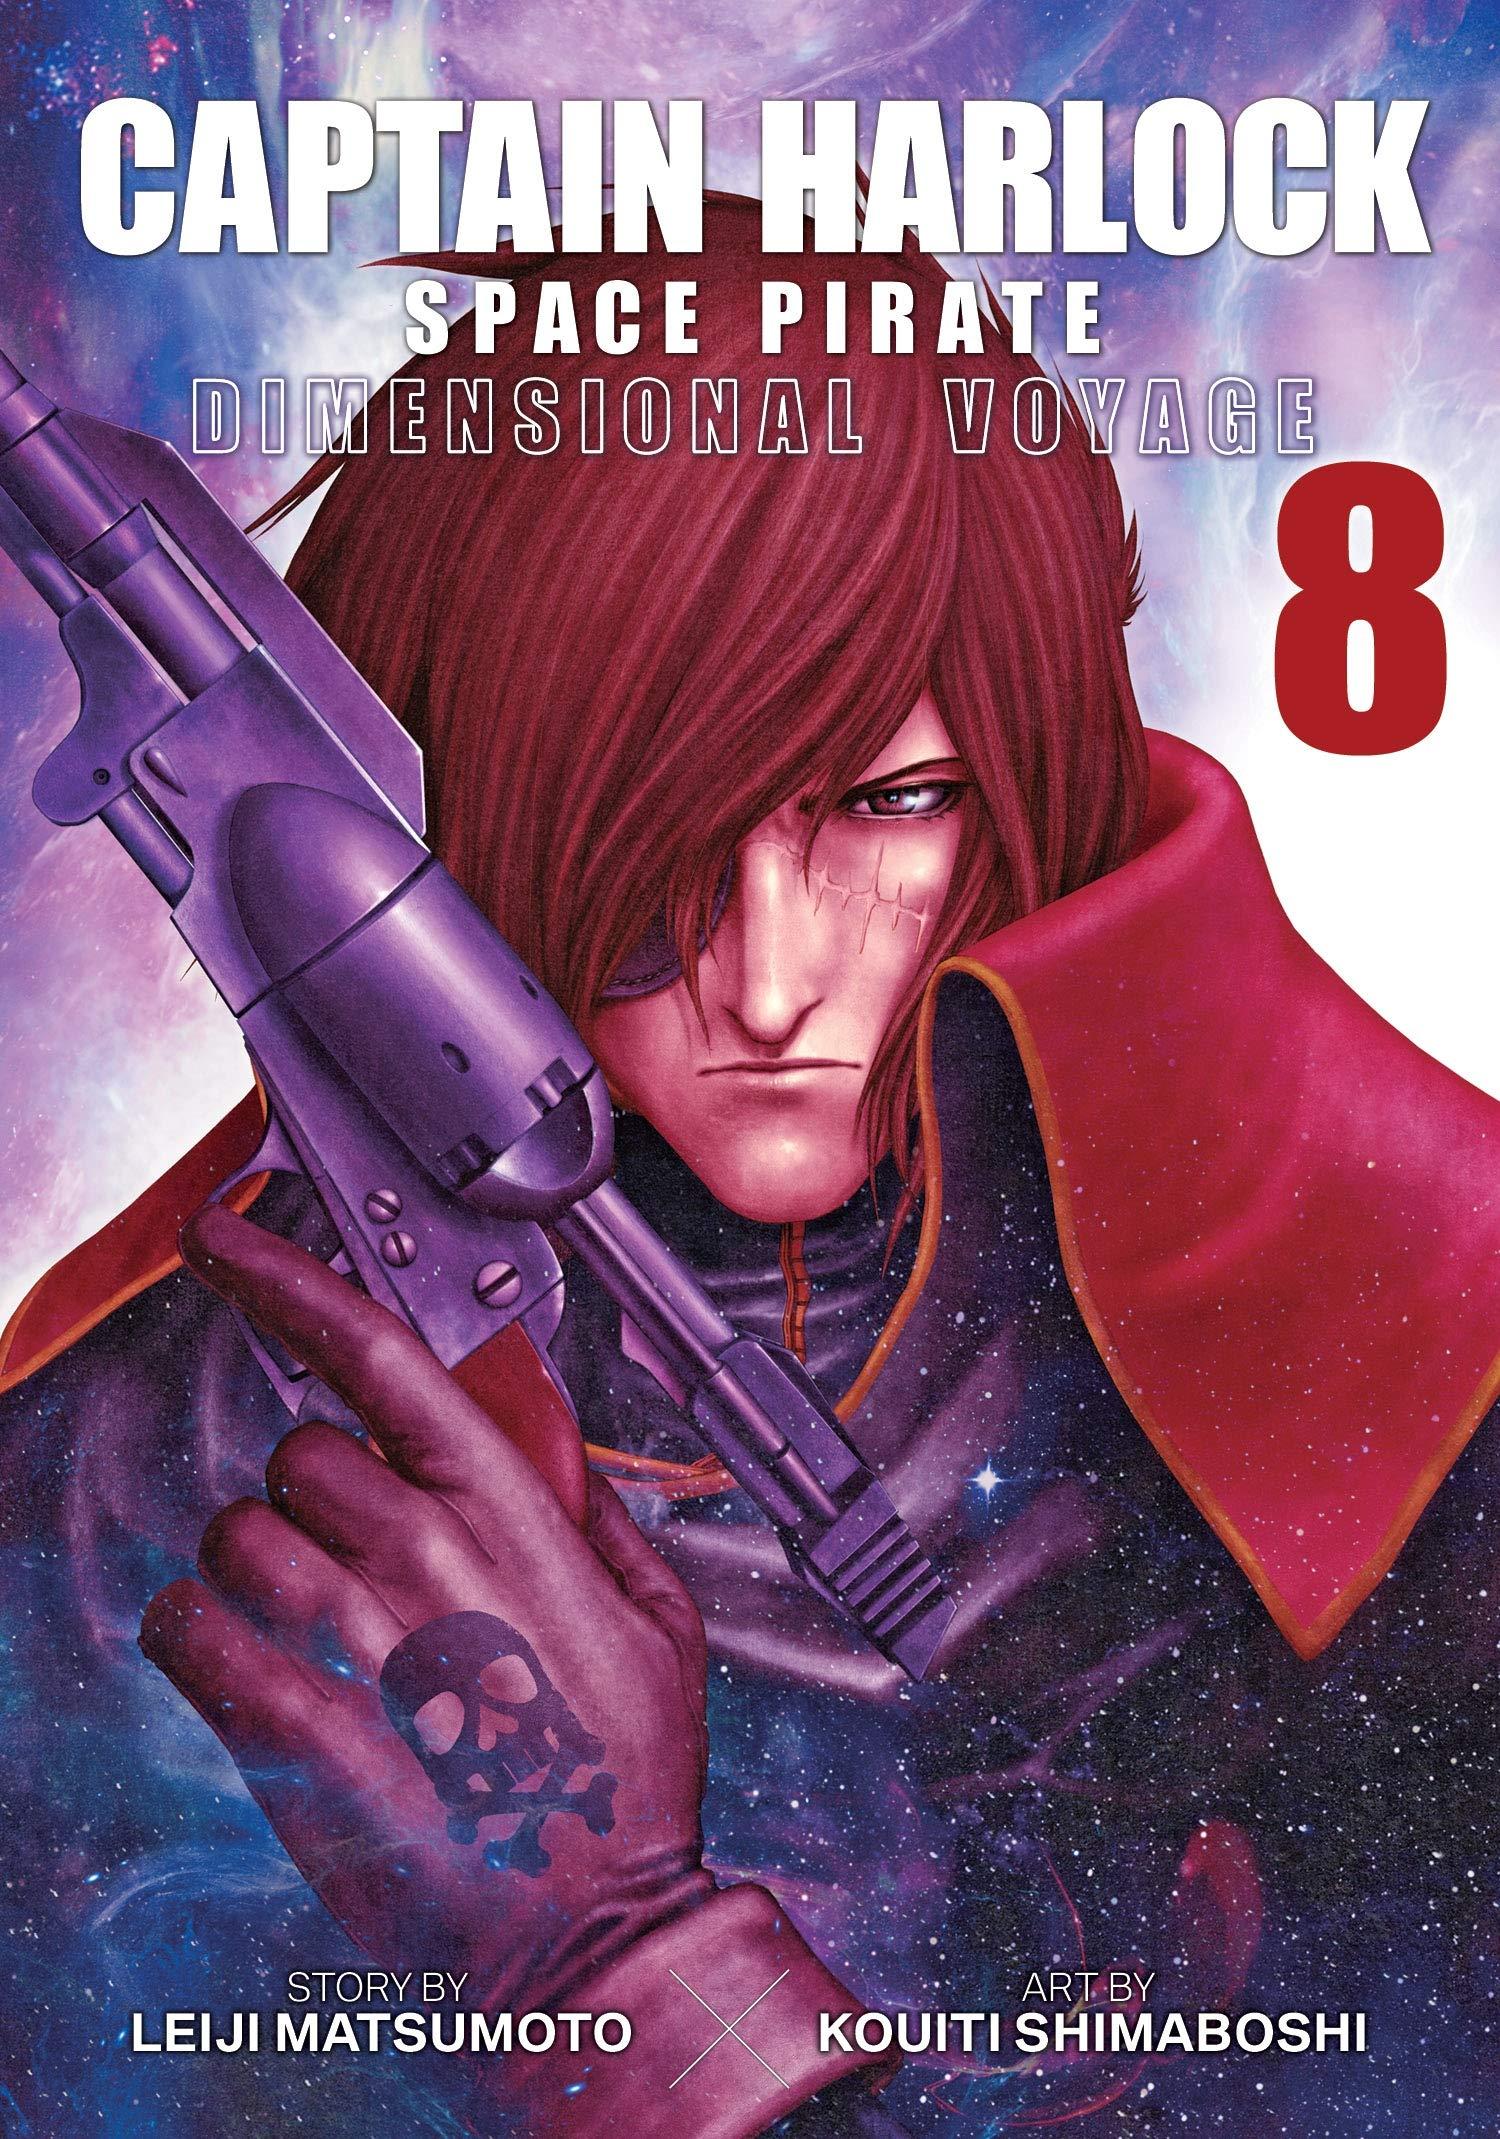 Captain Harlock Space Pirate 8: Dimensional Voyage: Amazon.it: Matsumoto,  Leiji, Shimaboshi, Kouiti: Libri in altre lingue